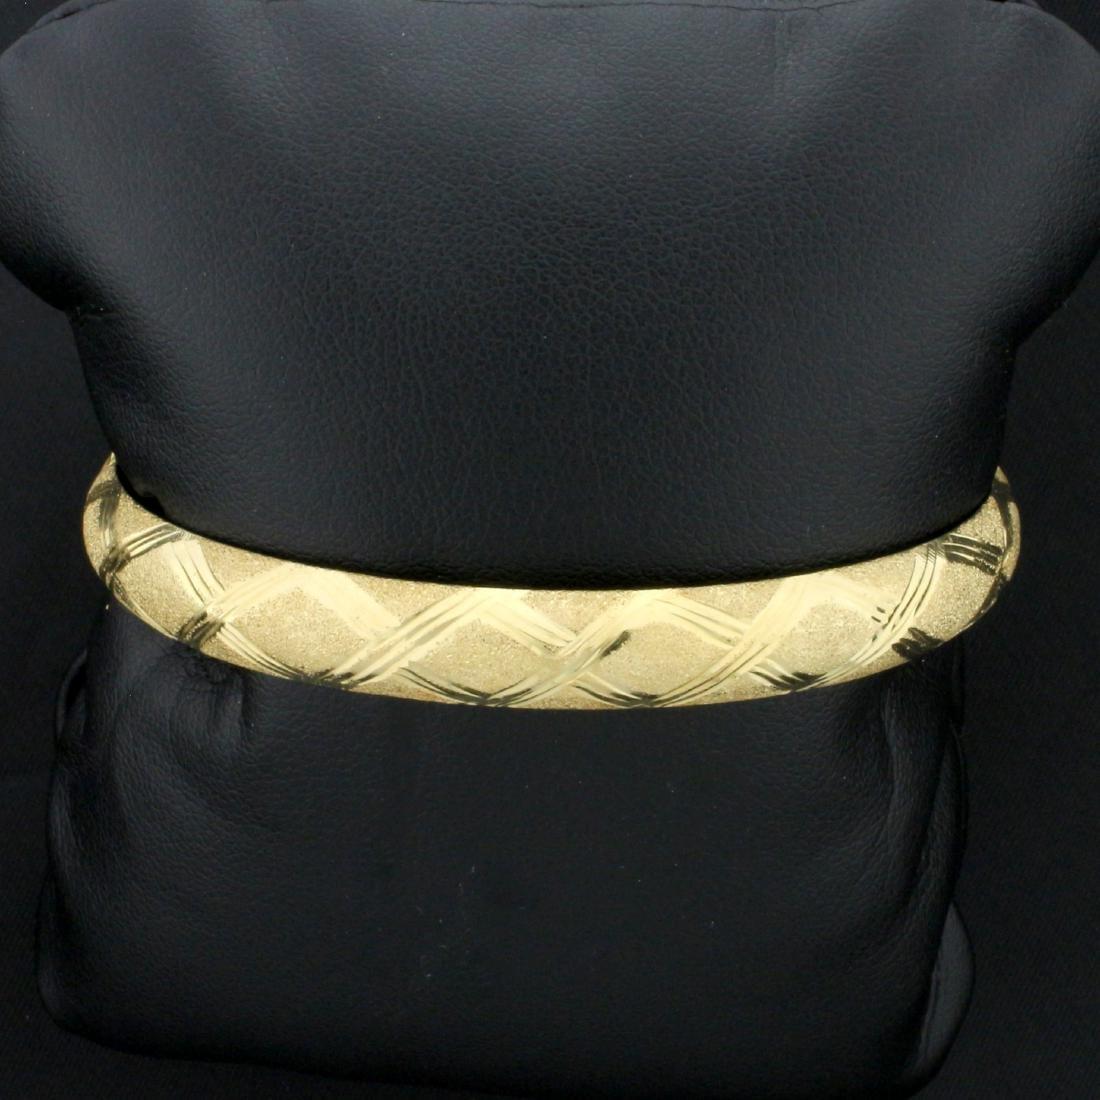 8mm Hinged Bangle Bracelet in 14K Yellow Gold